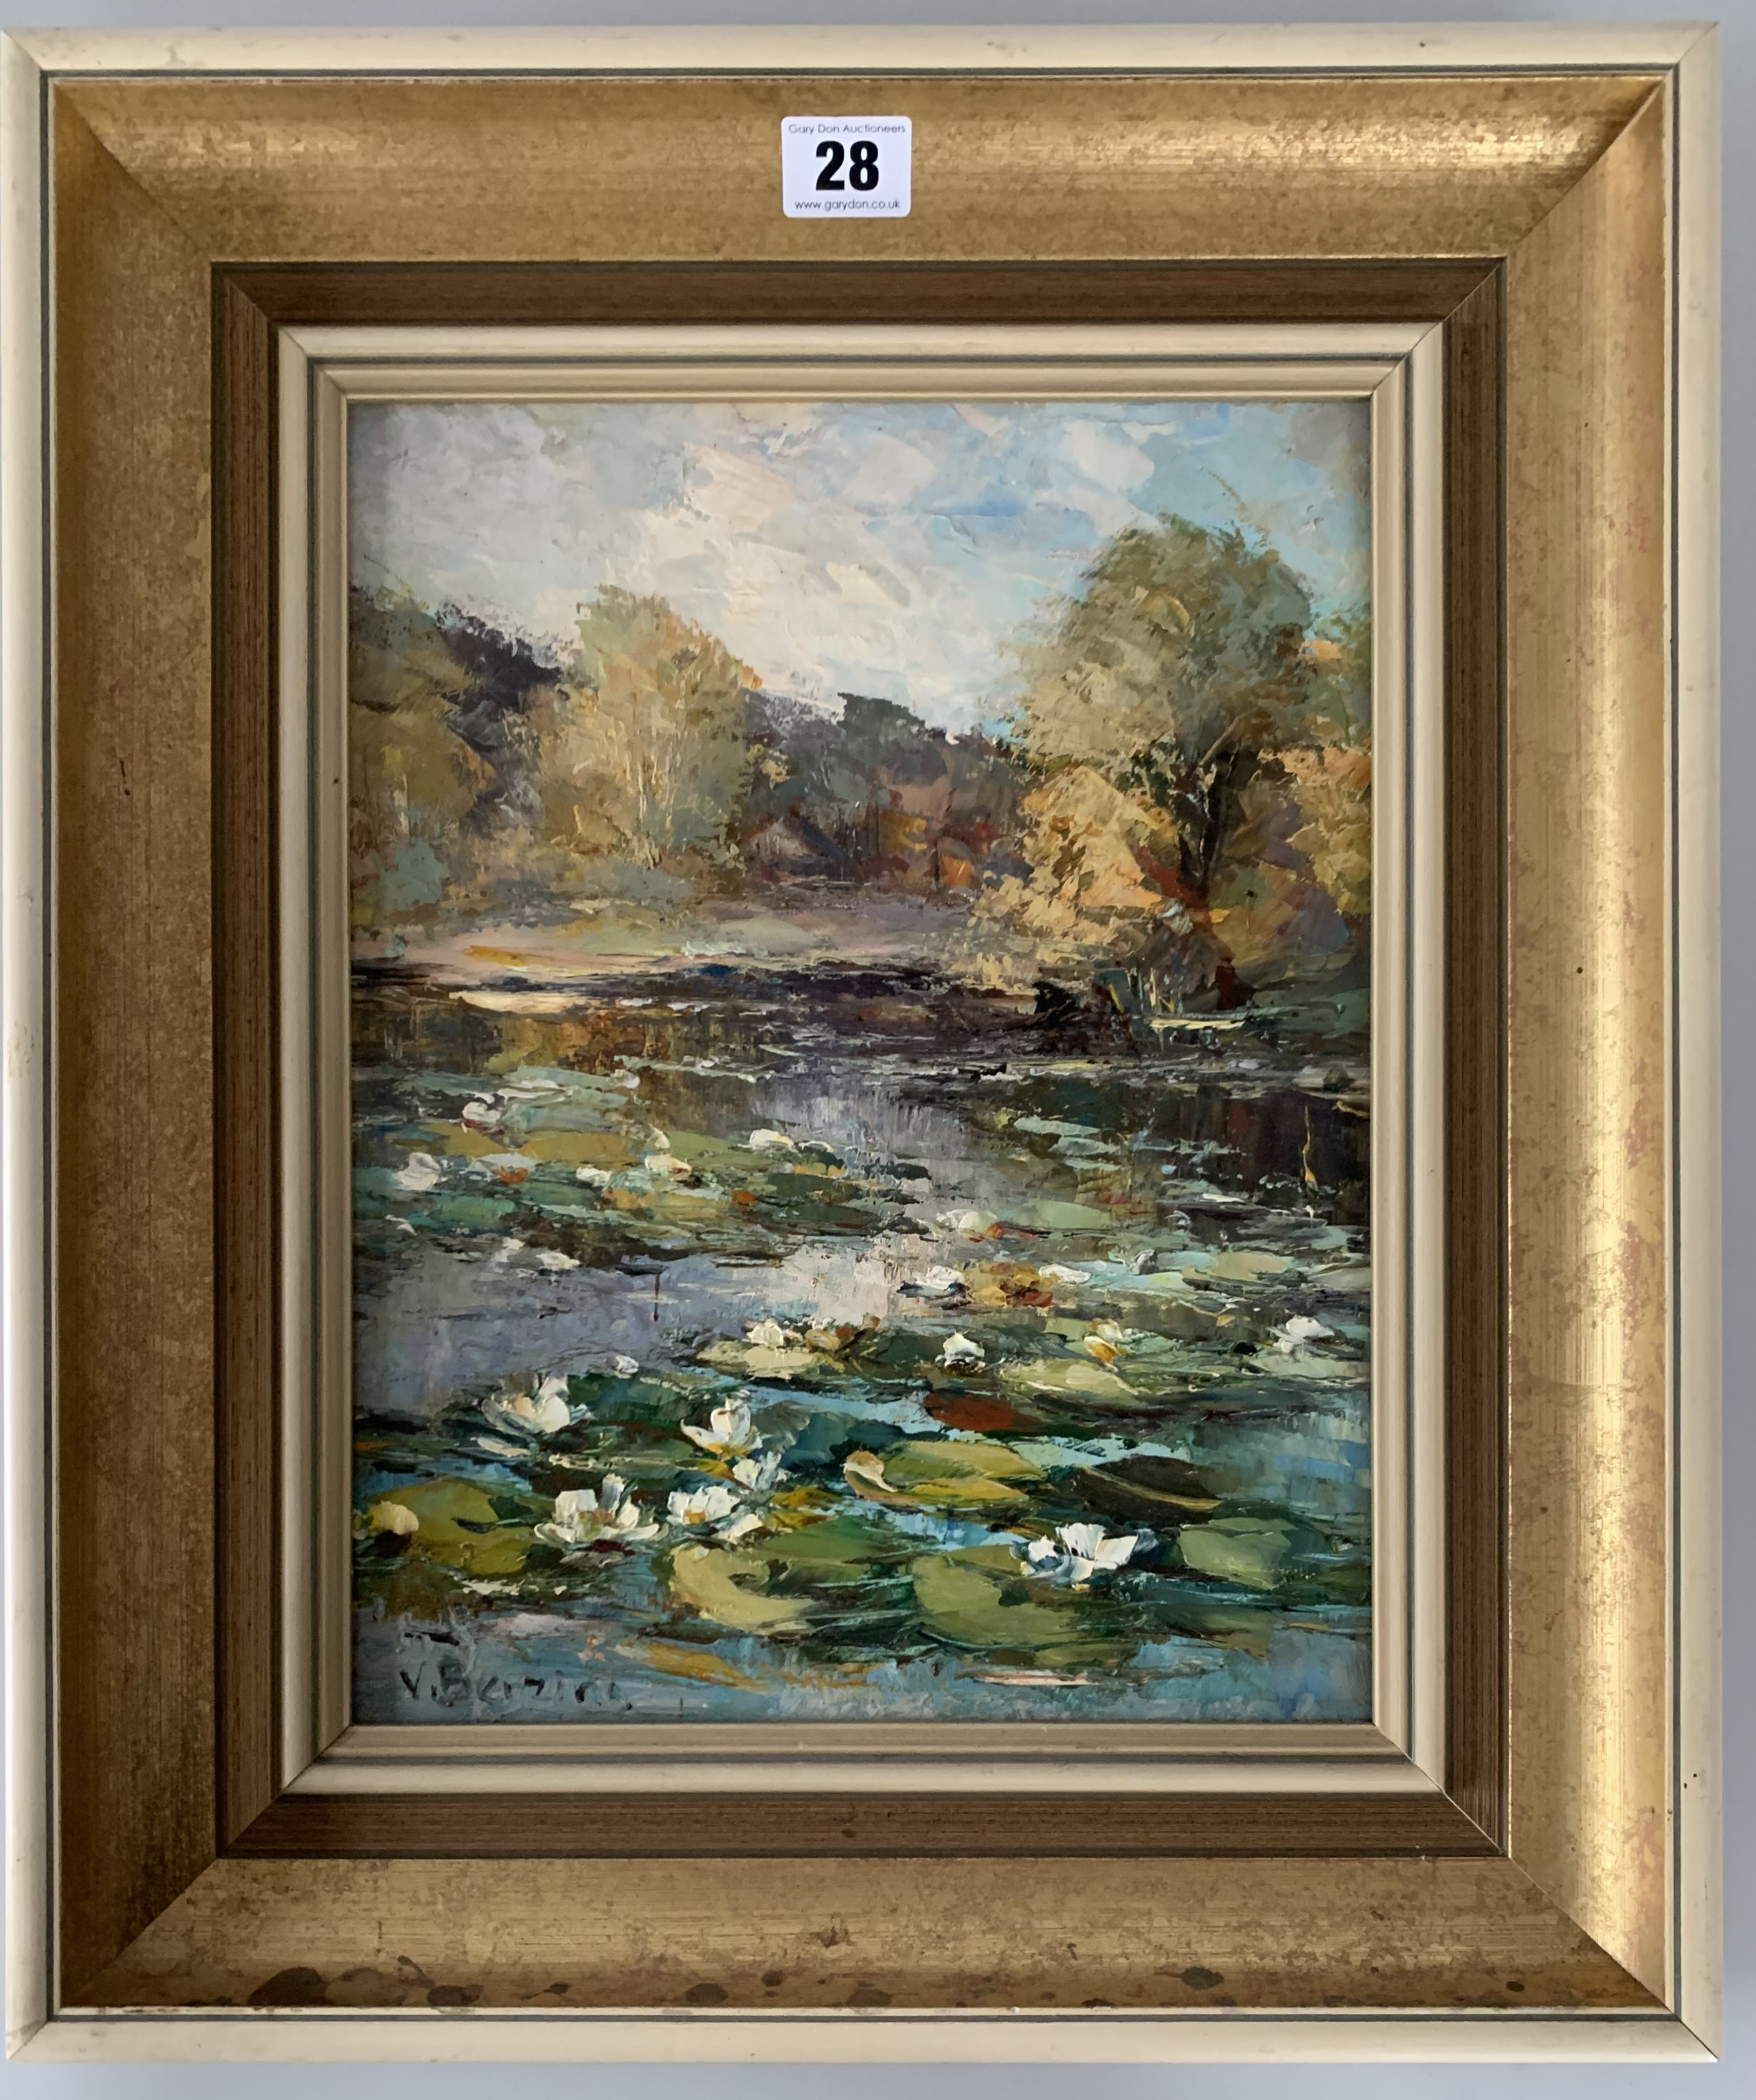 "Oil on board of lily pond by V. Berzins. Image 10"" x 13"", frame 15.5"" x 18.5""."